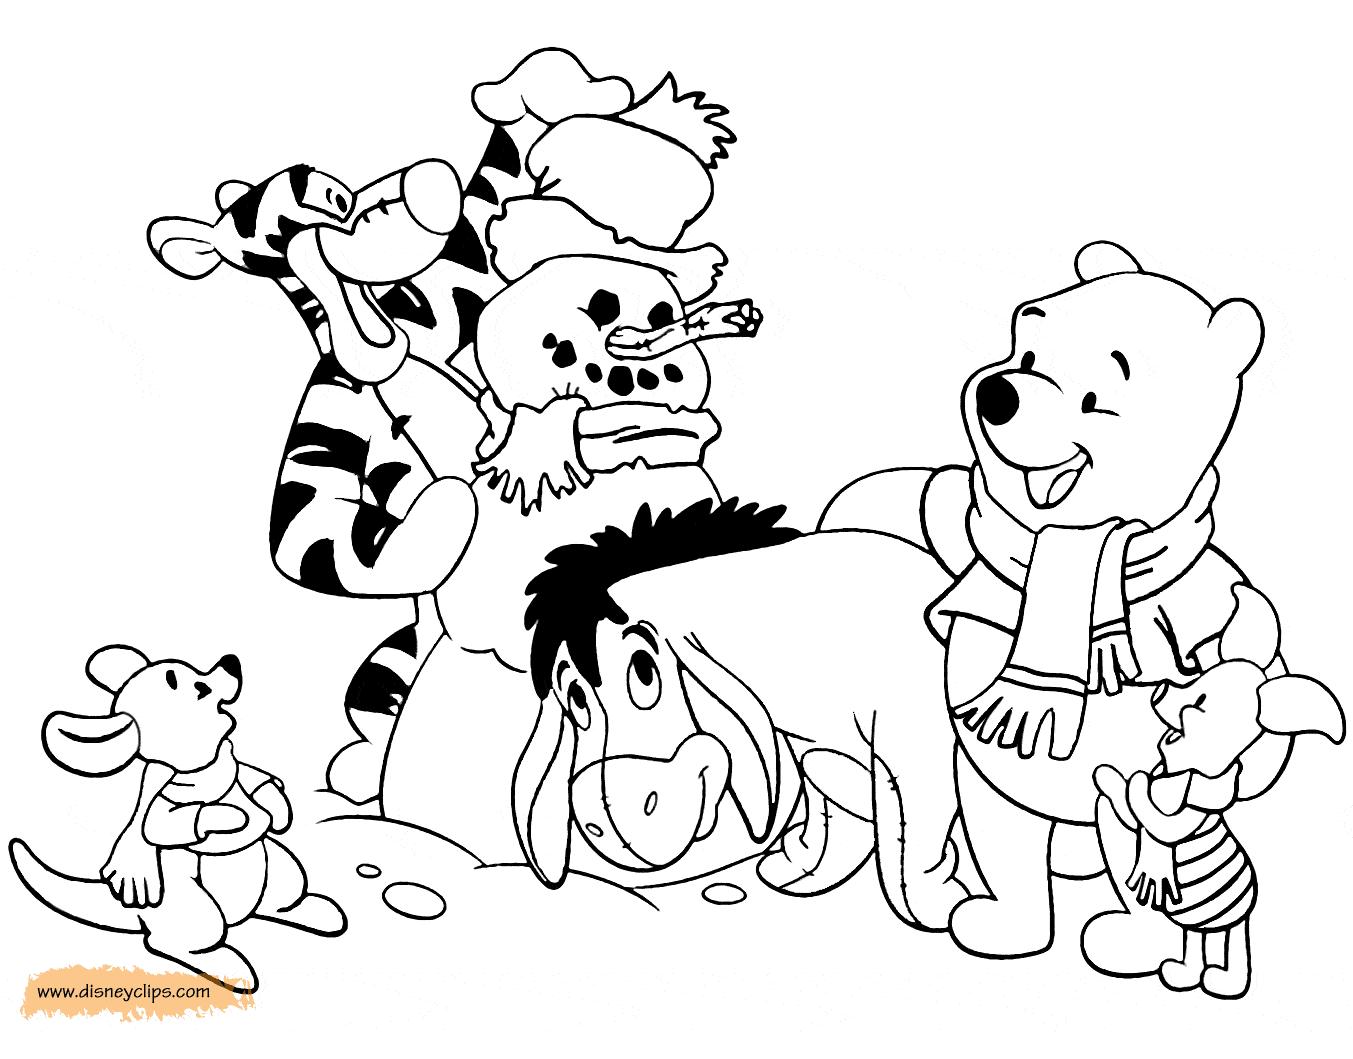 Coloring page of Winnie the Pooh, Tigger, Piglet, Eeyore